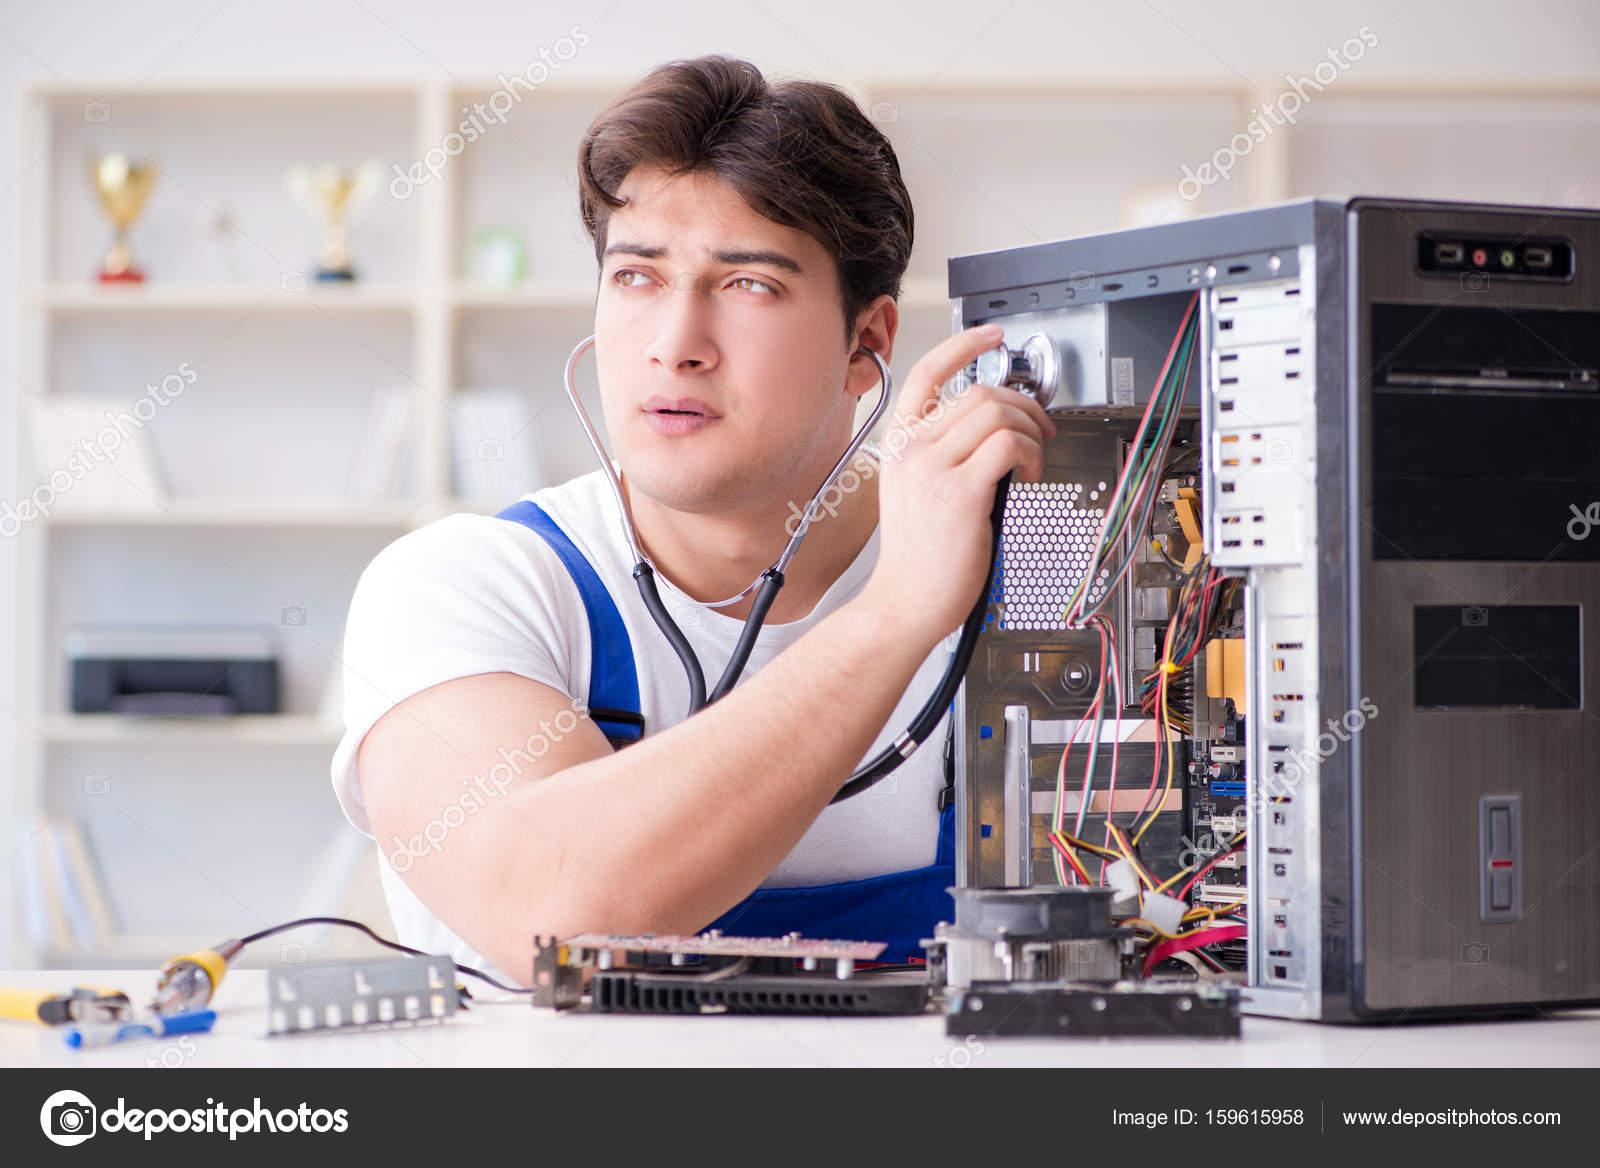 Computer Repairman Repairing Desktop Stock Photo Elnur Circuit Board Royalty Free Image By